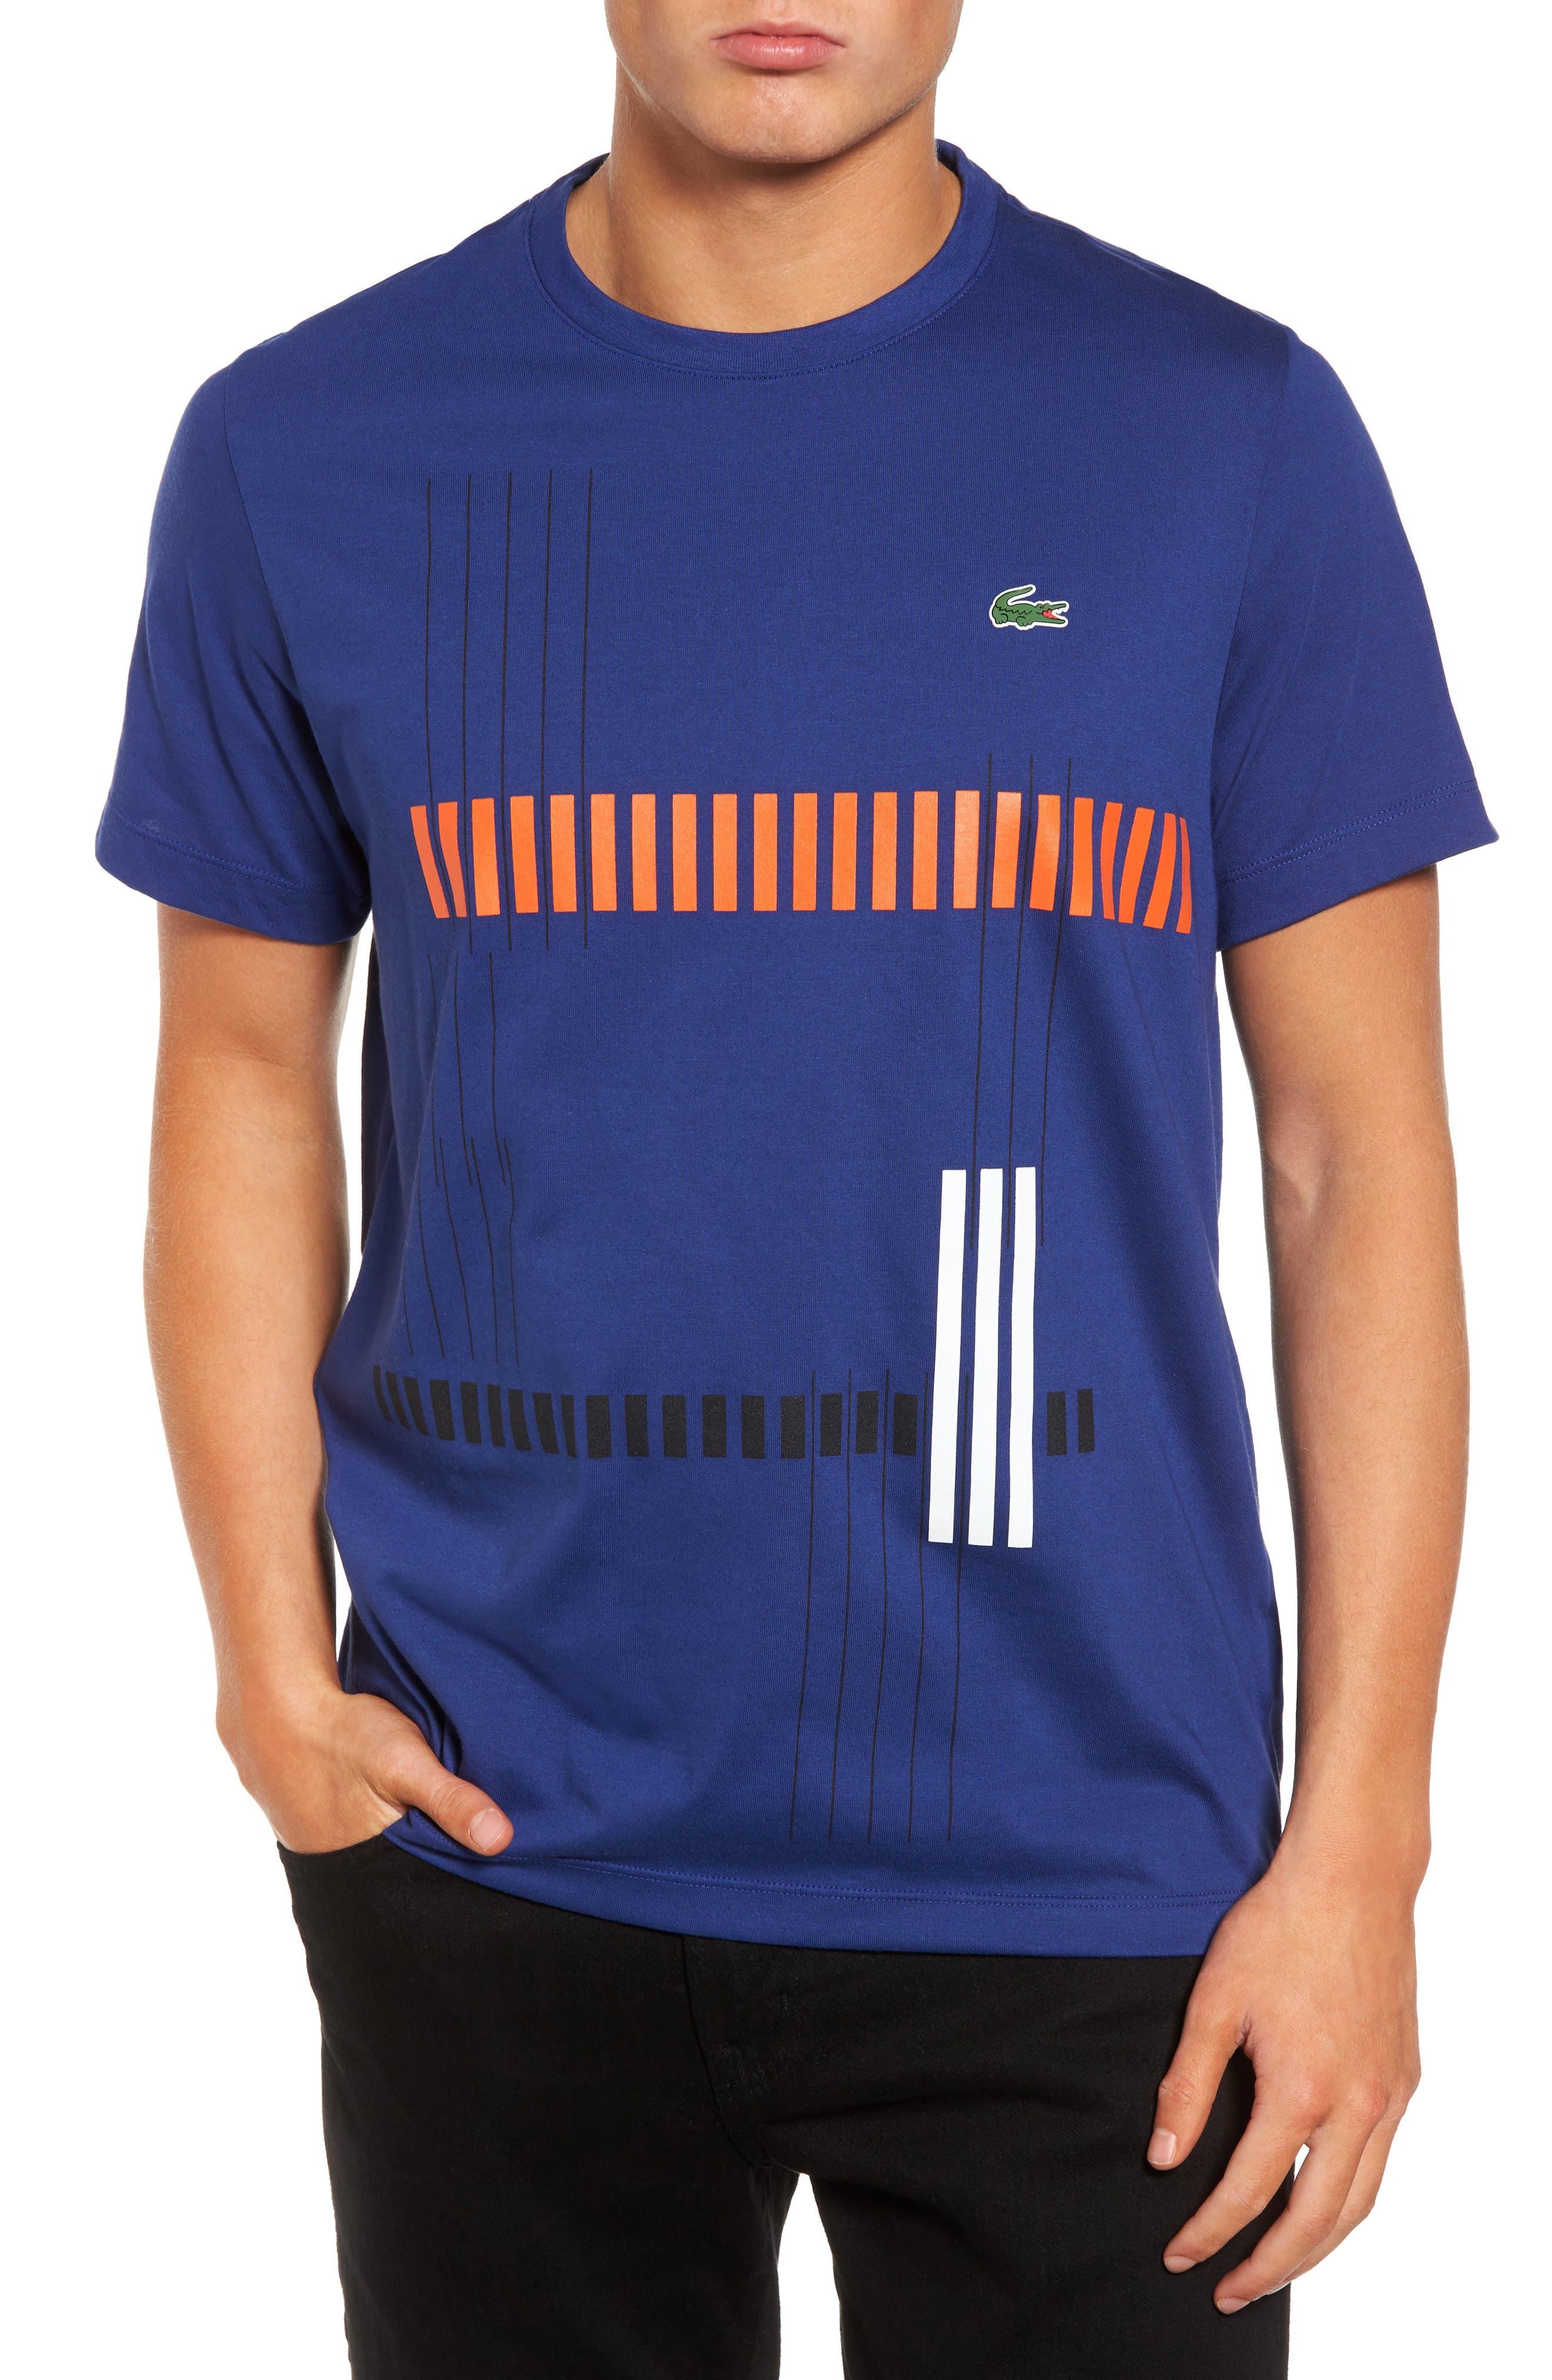 Lacoste Tech Vertical Stripe Graphic T-Shirt